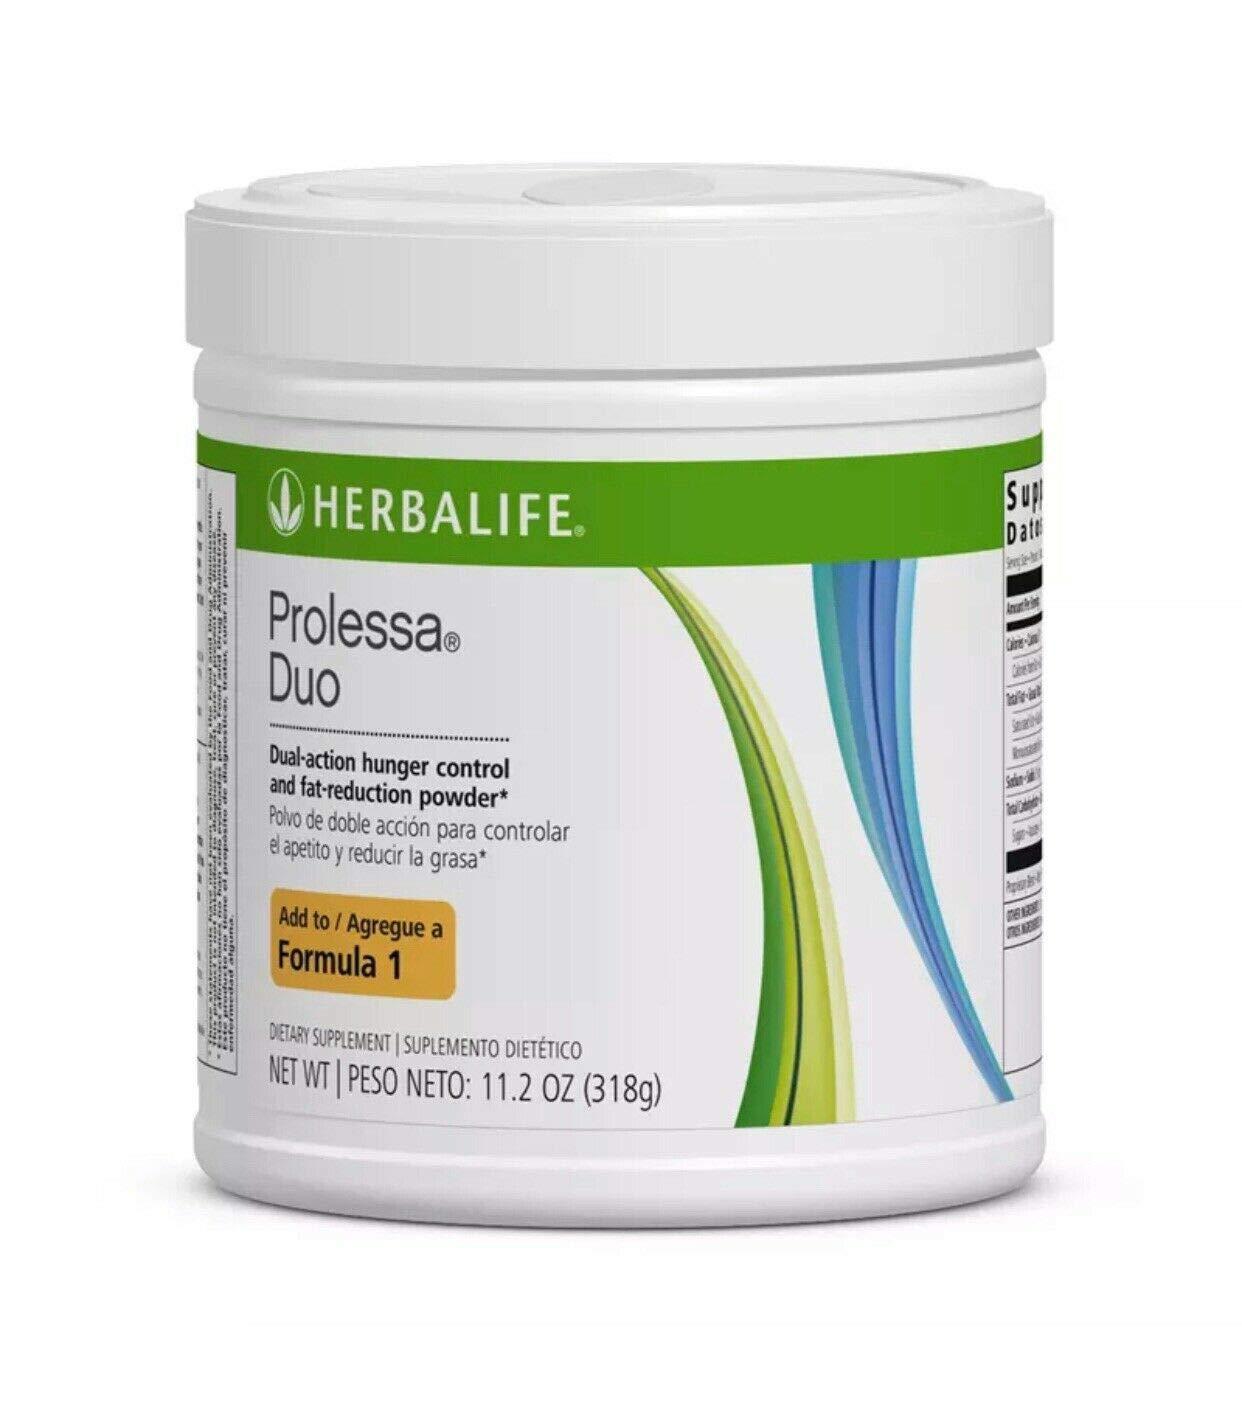 Herbalife Prolessa Duo - 30-Day Supply by Herbalfie